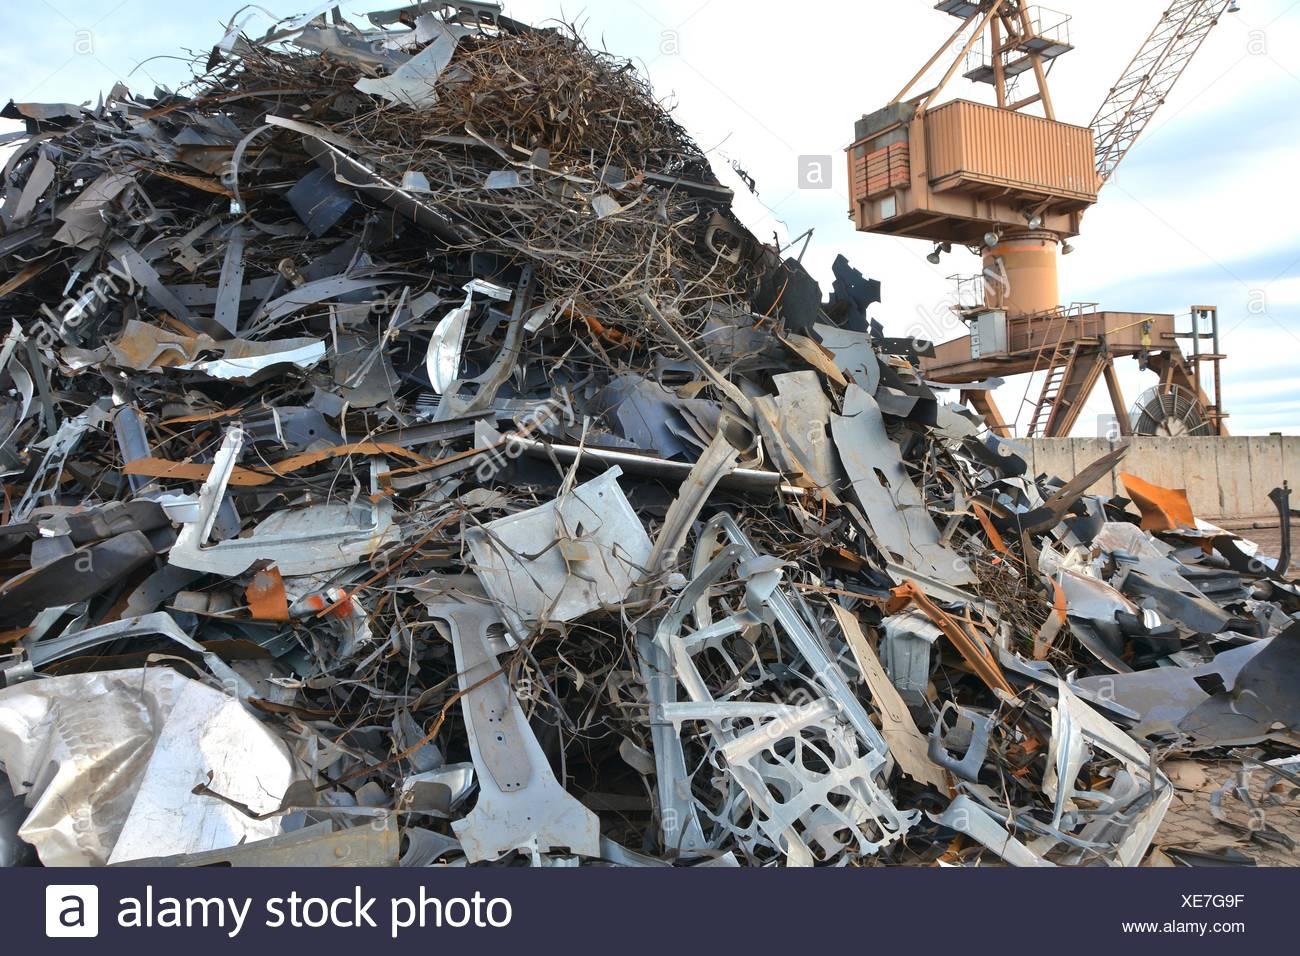 Scrap Trading Stock Photos Amp Scrap Trading Stock Images